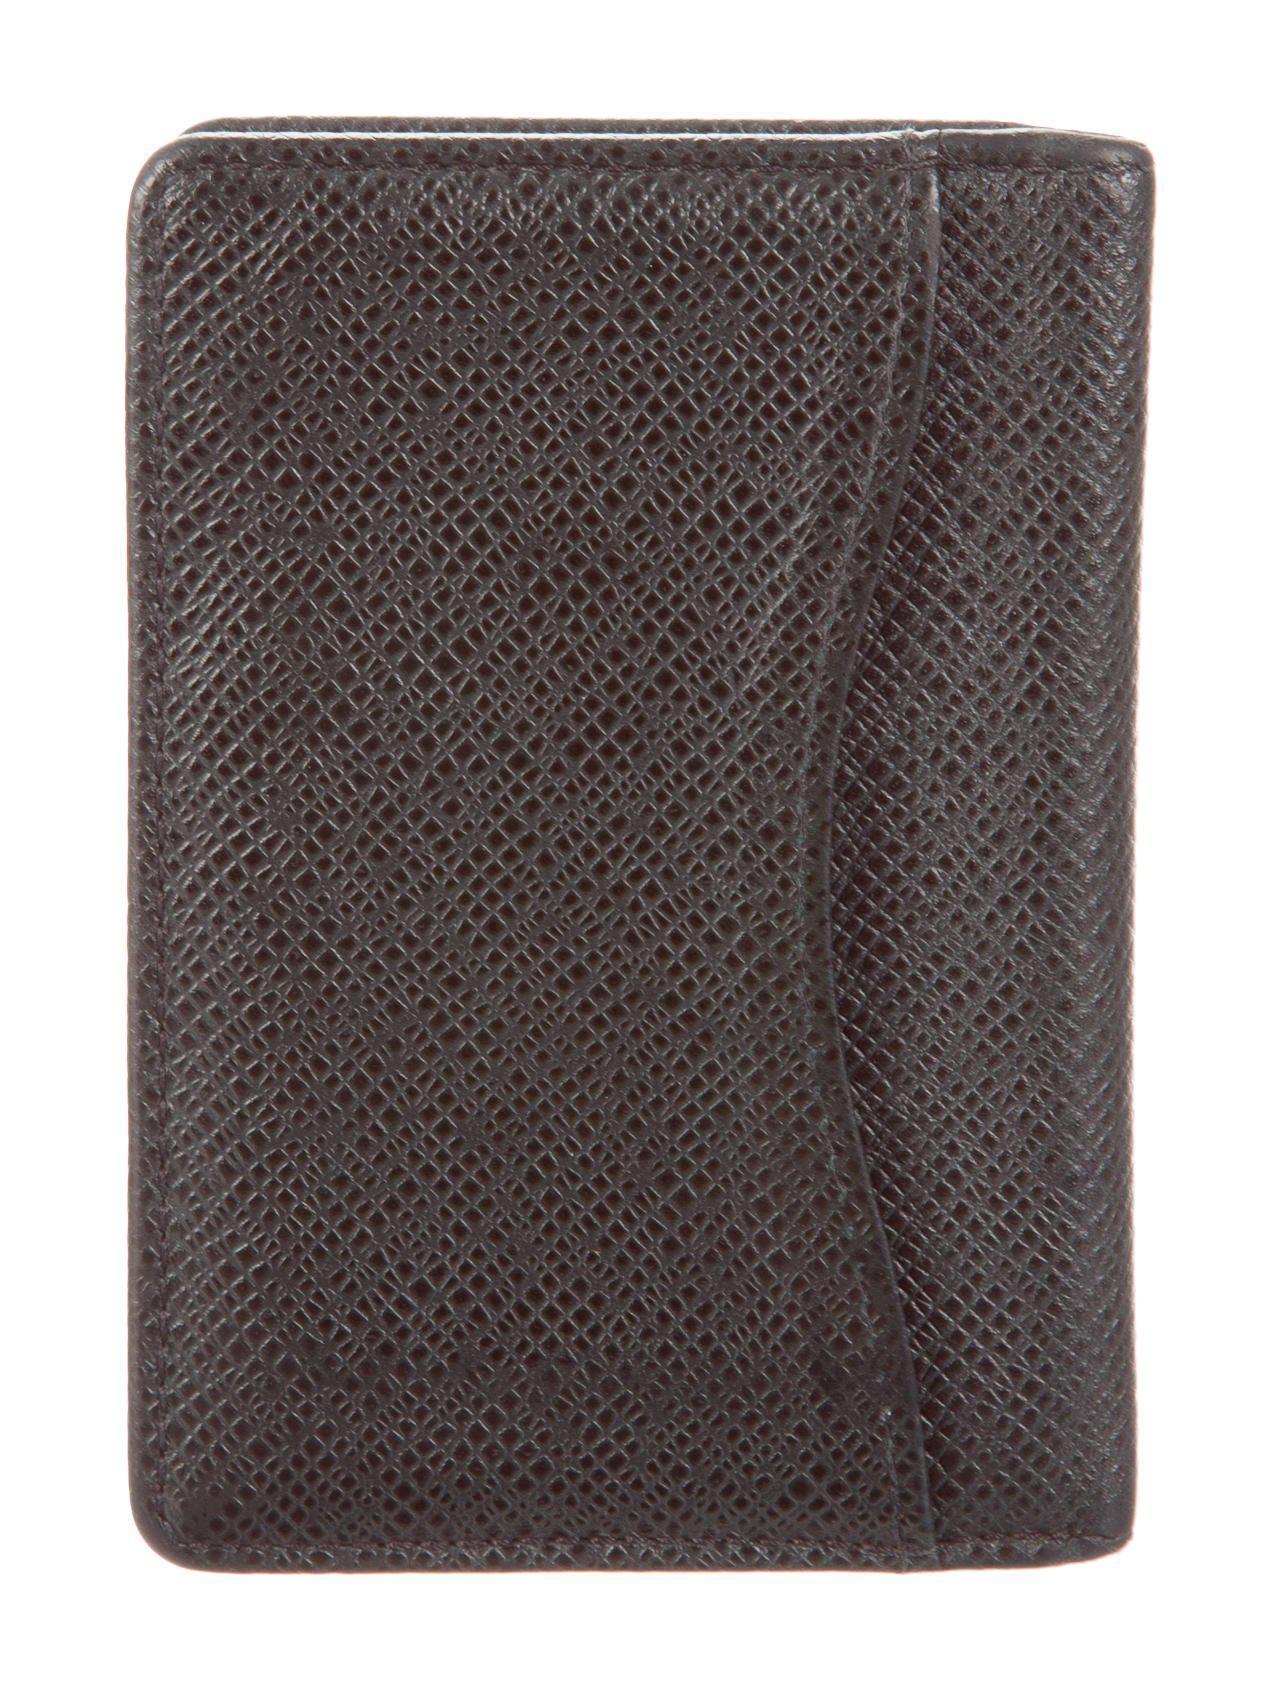 1493498750c4 Lyst - Louis Vuitton Taiga Card Holder in Black for Men